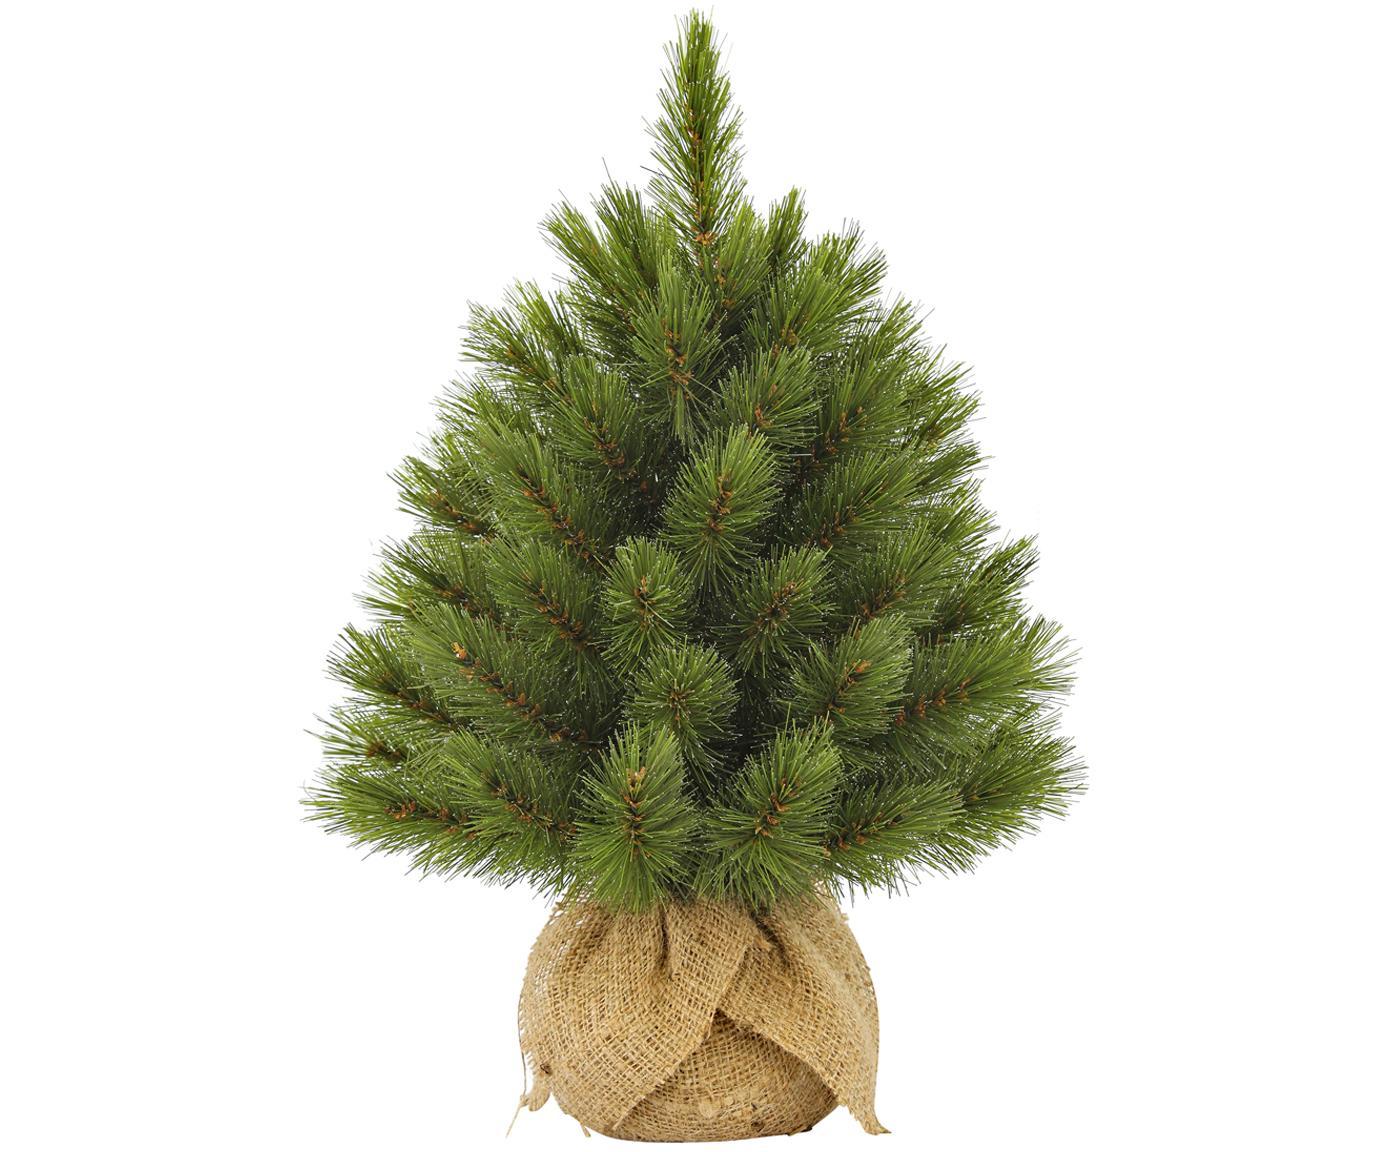 Decoratieve kerstboom Forest, Groen, Ø 36 x H 45 cm